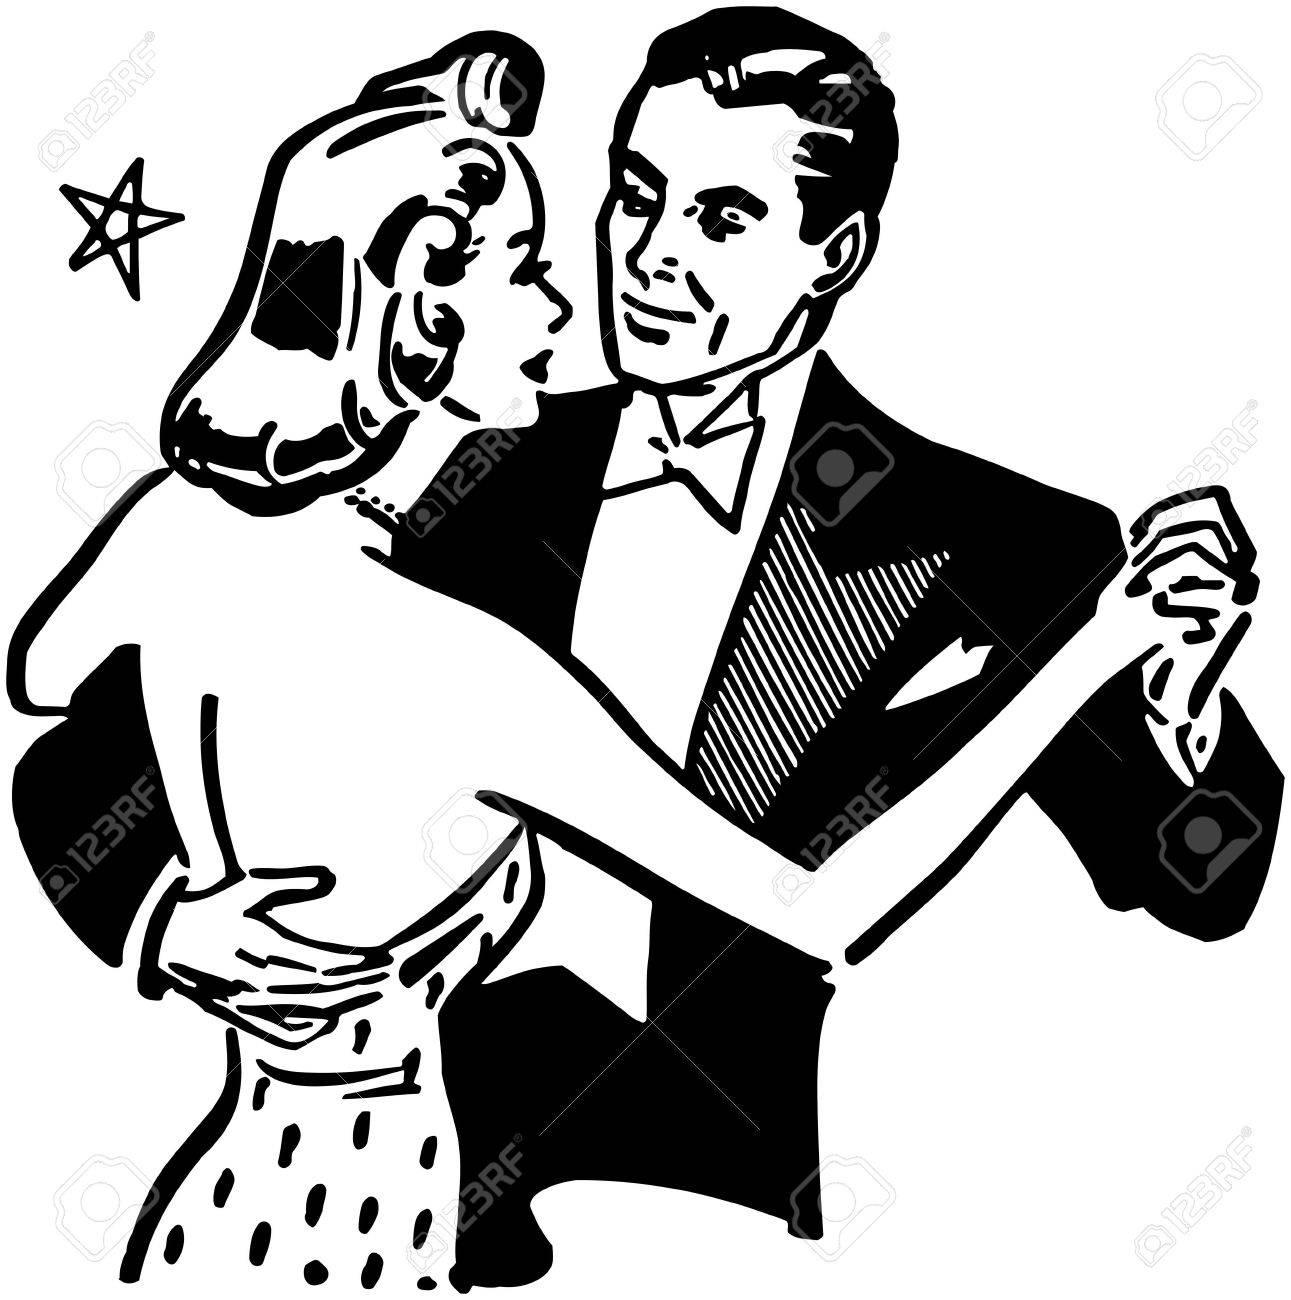 Dance Couple Stock Vector - 28334747